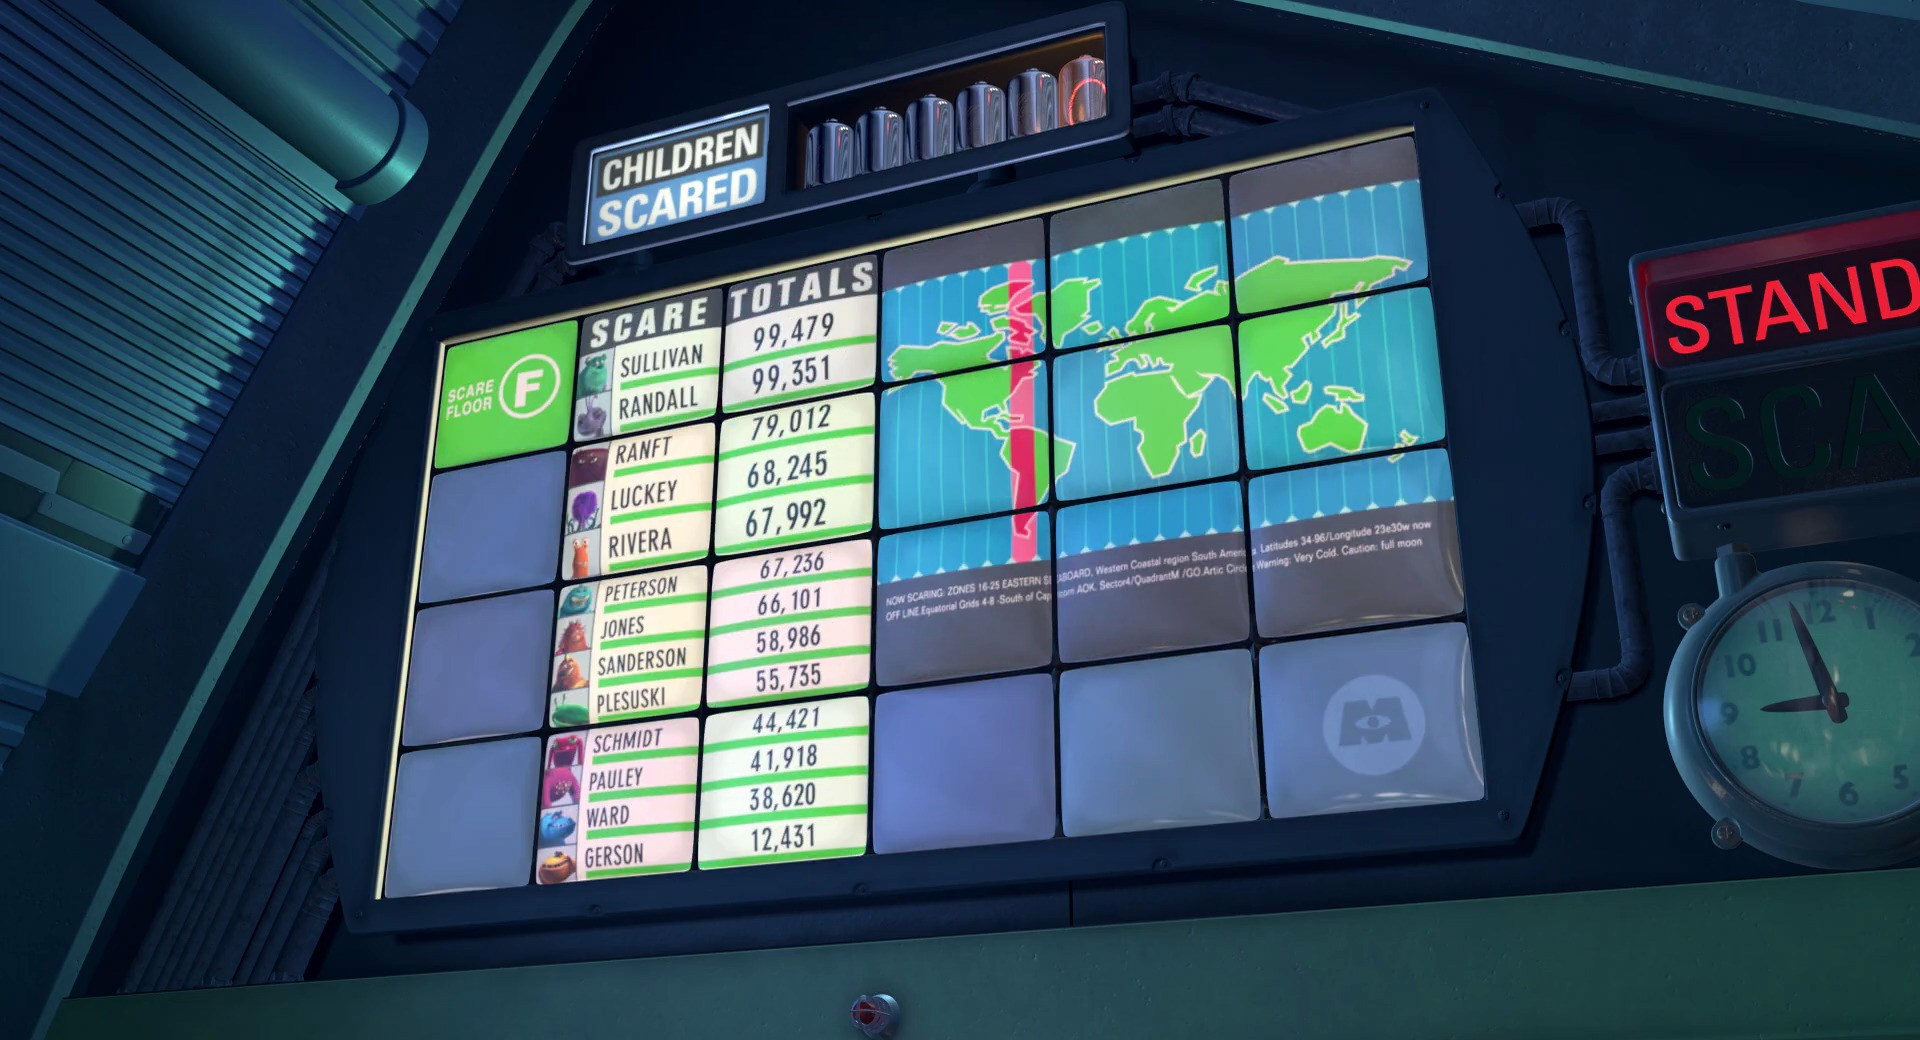 Scarer's Leaderboard | Pixar Wiki | FANDOM powered by Wikia